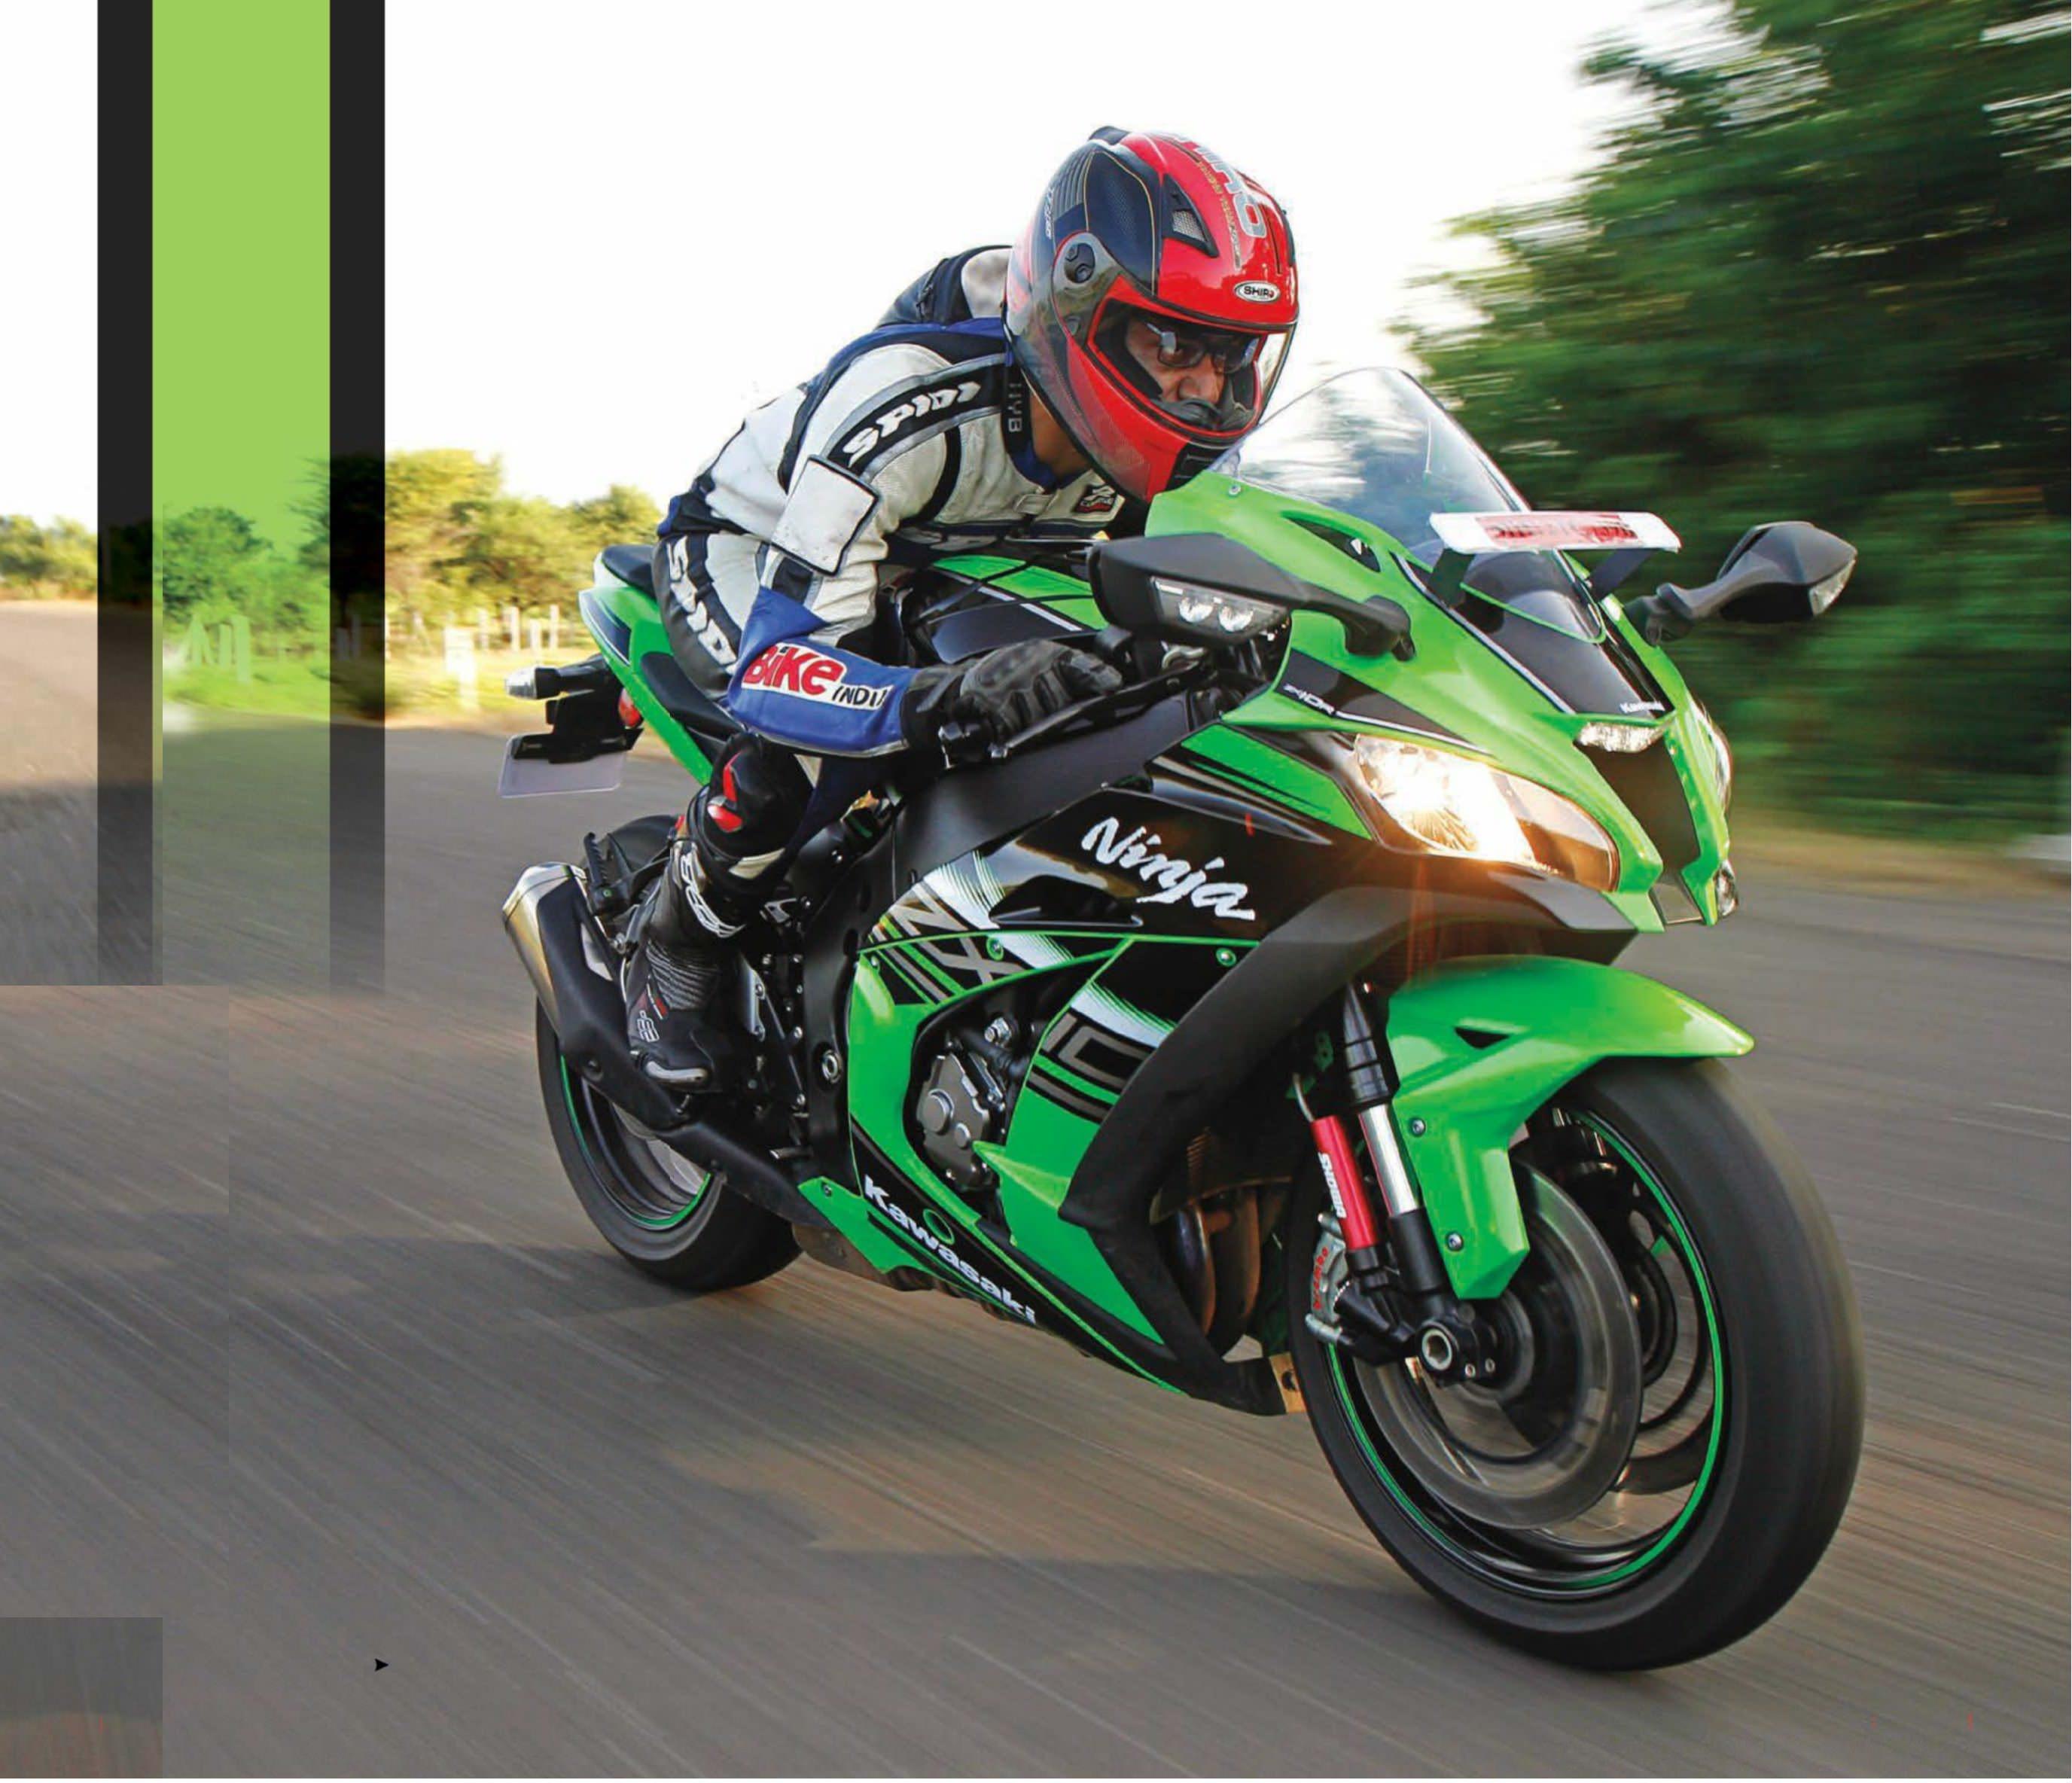 The track-ready Kawasaki Ninja ZX-10RR supplies the power